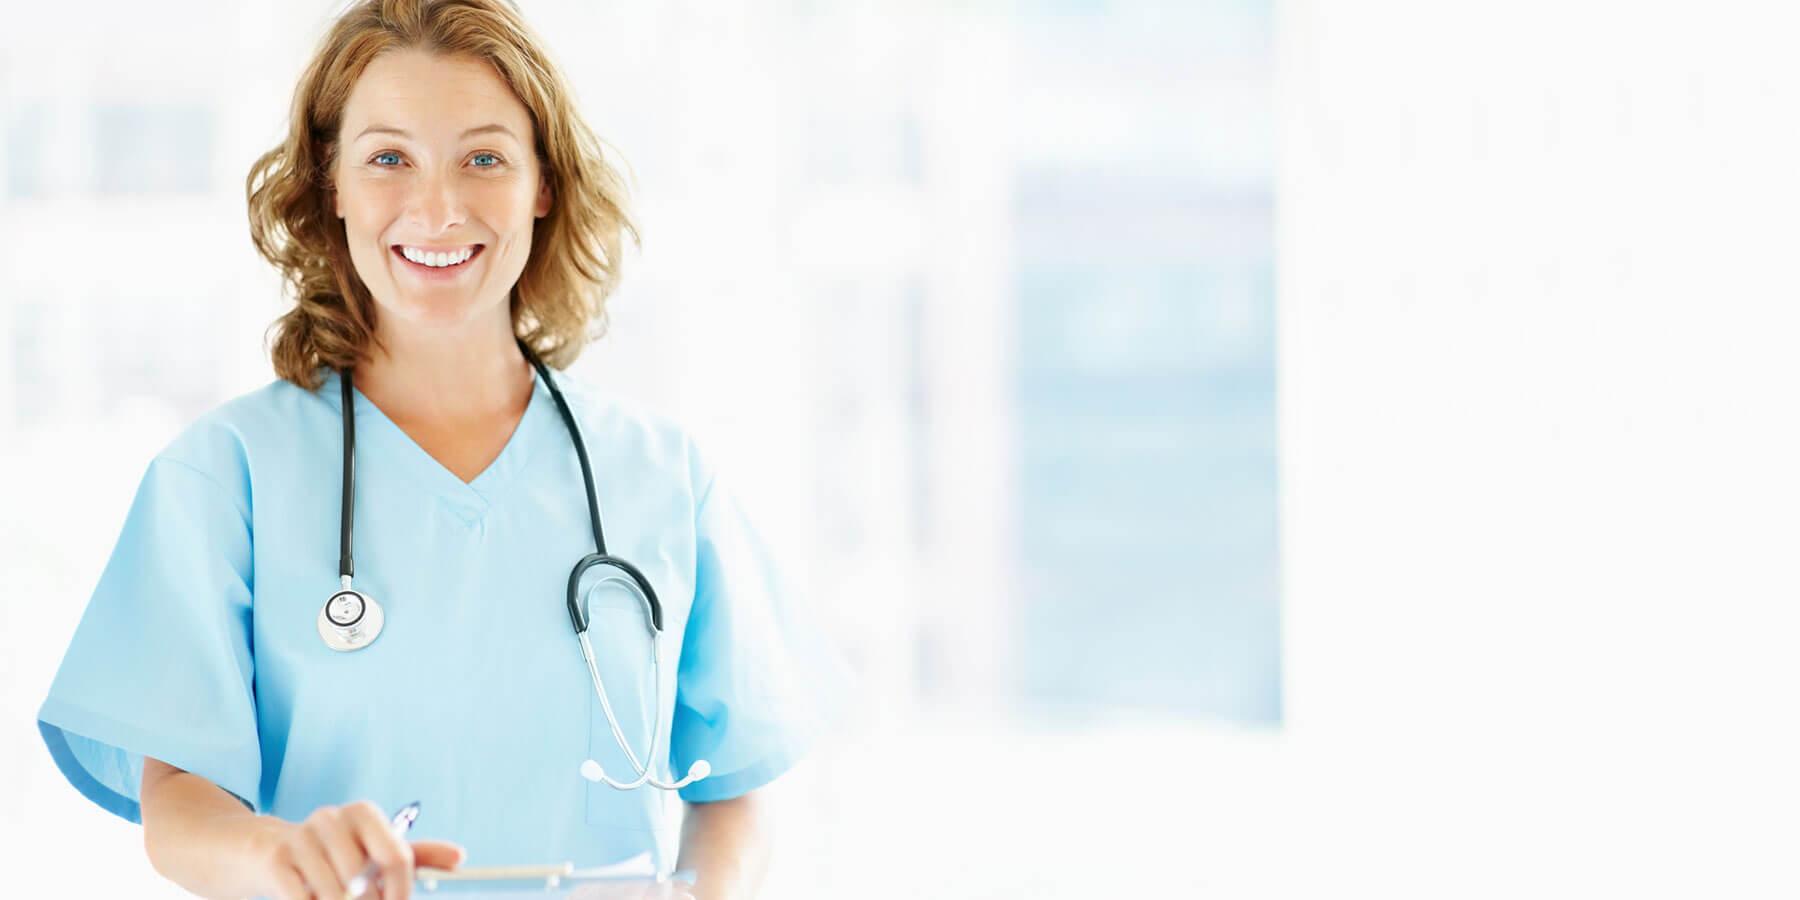 Cardinal Health's Travel Medicine and Vaccine Credentialing Program